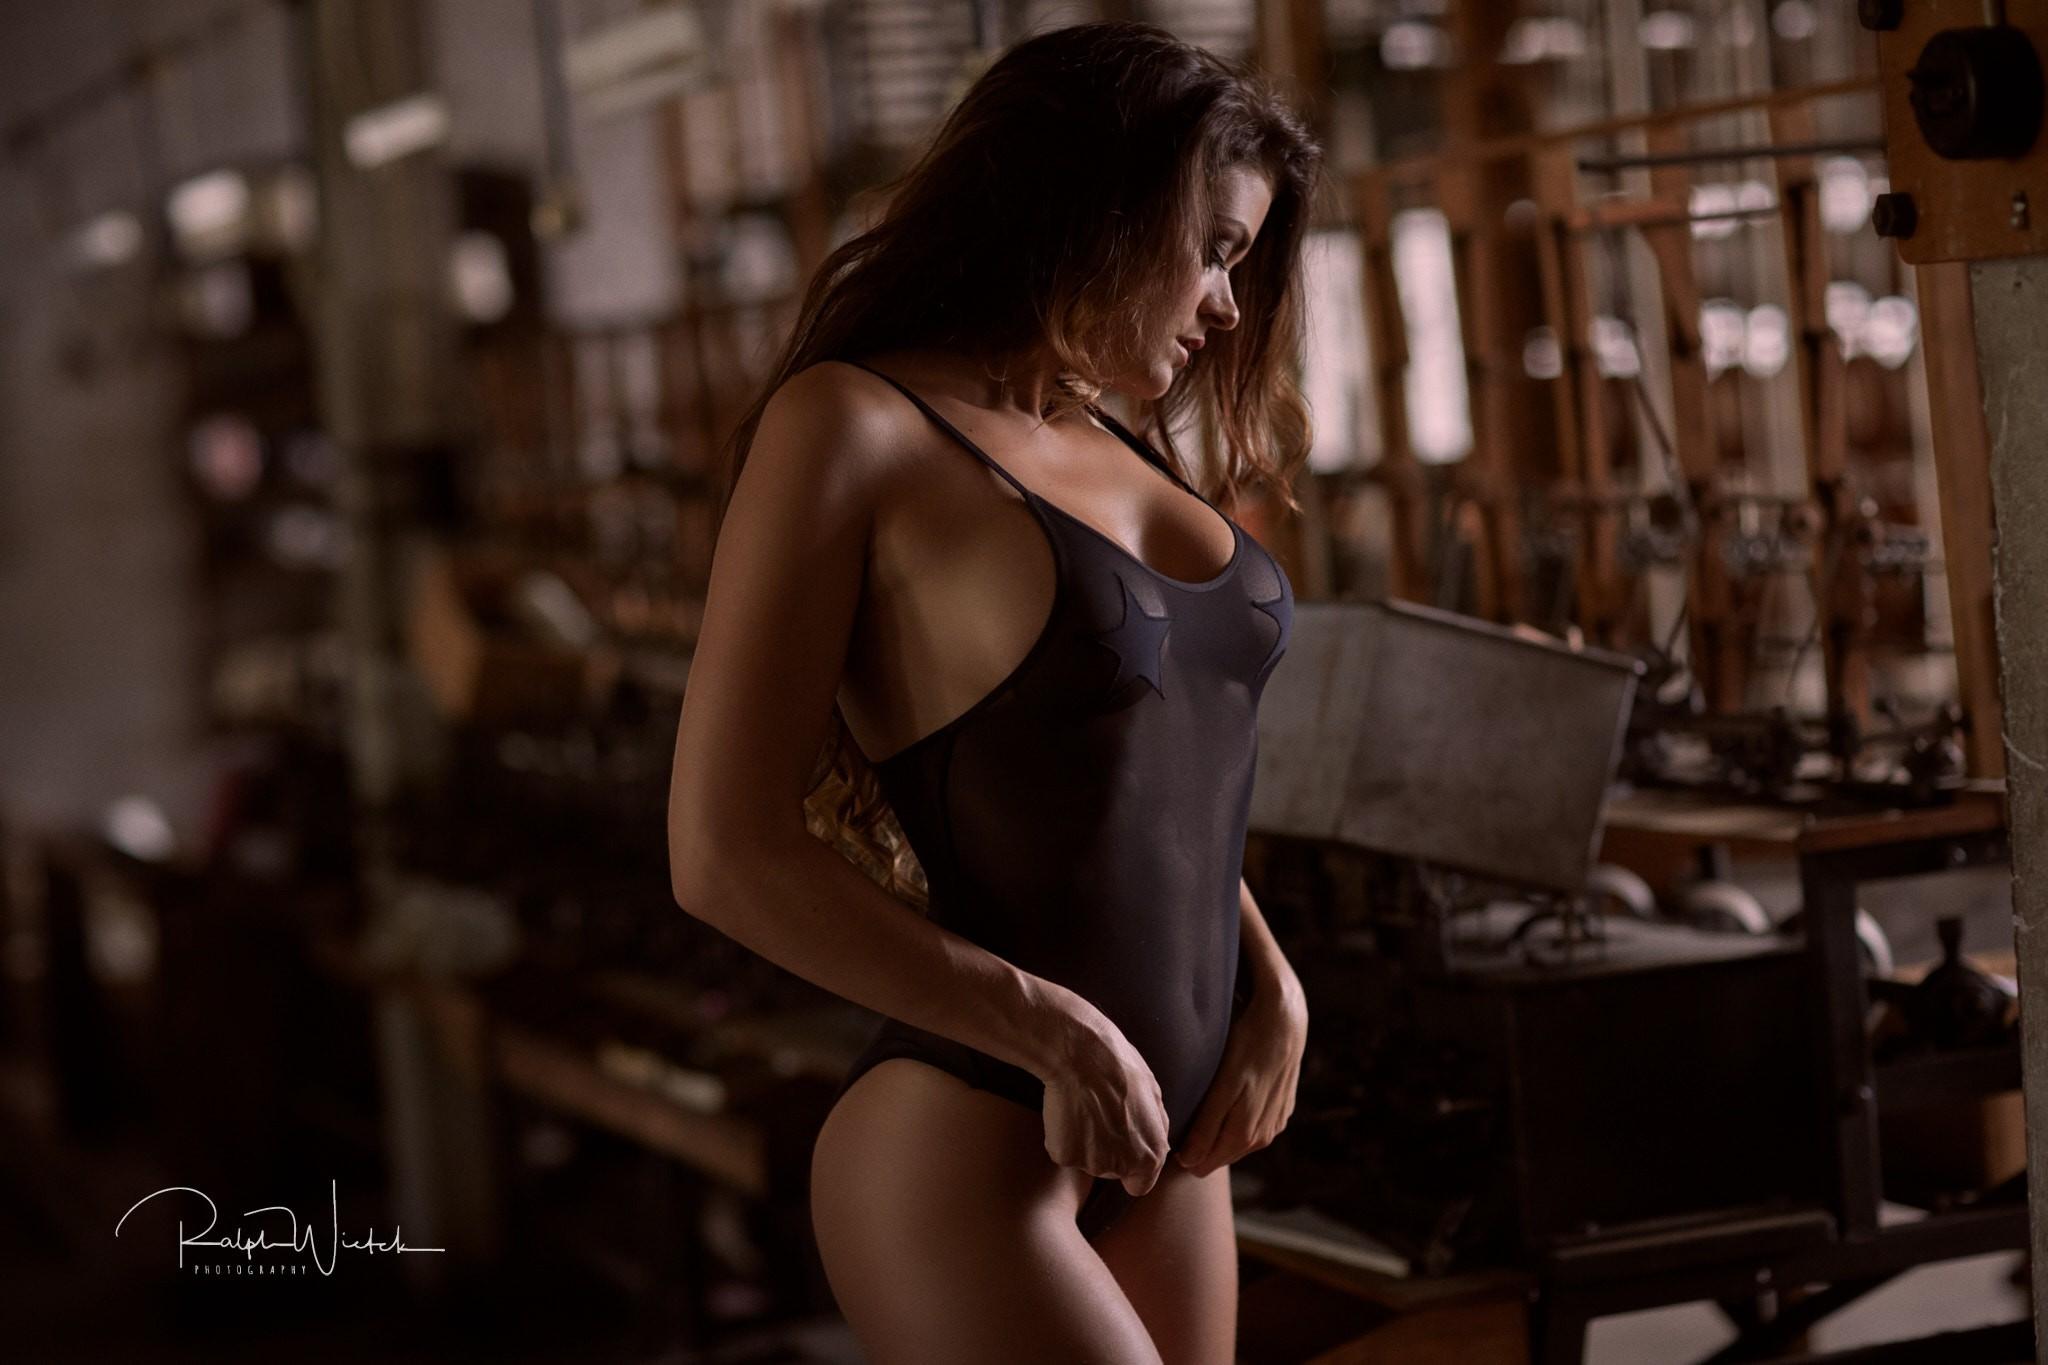 Hot Christina Braun naked (14 photos), Sexy, Cleavage, Boobs, in bikini 2019